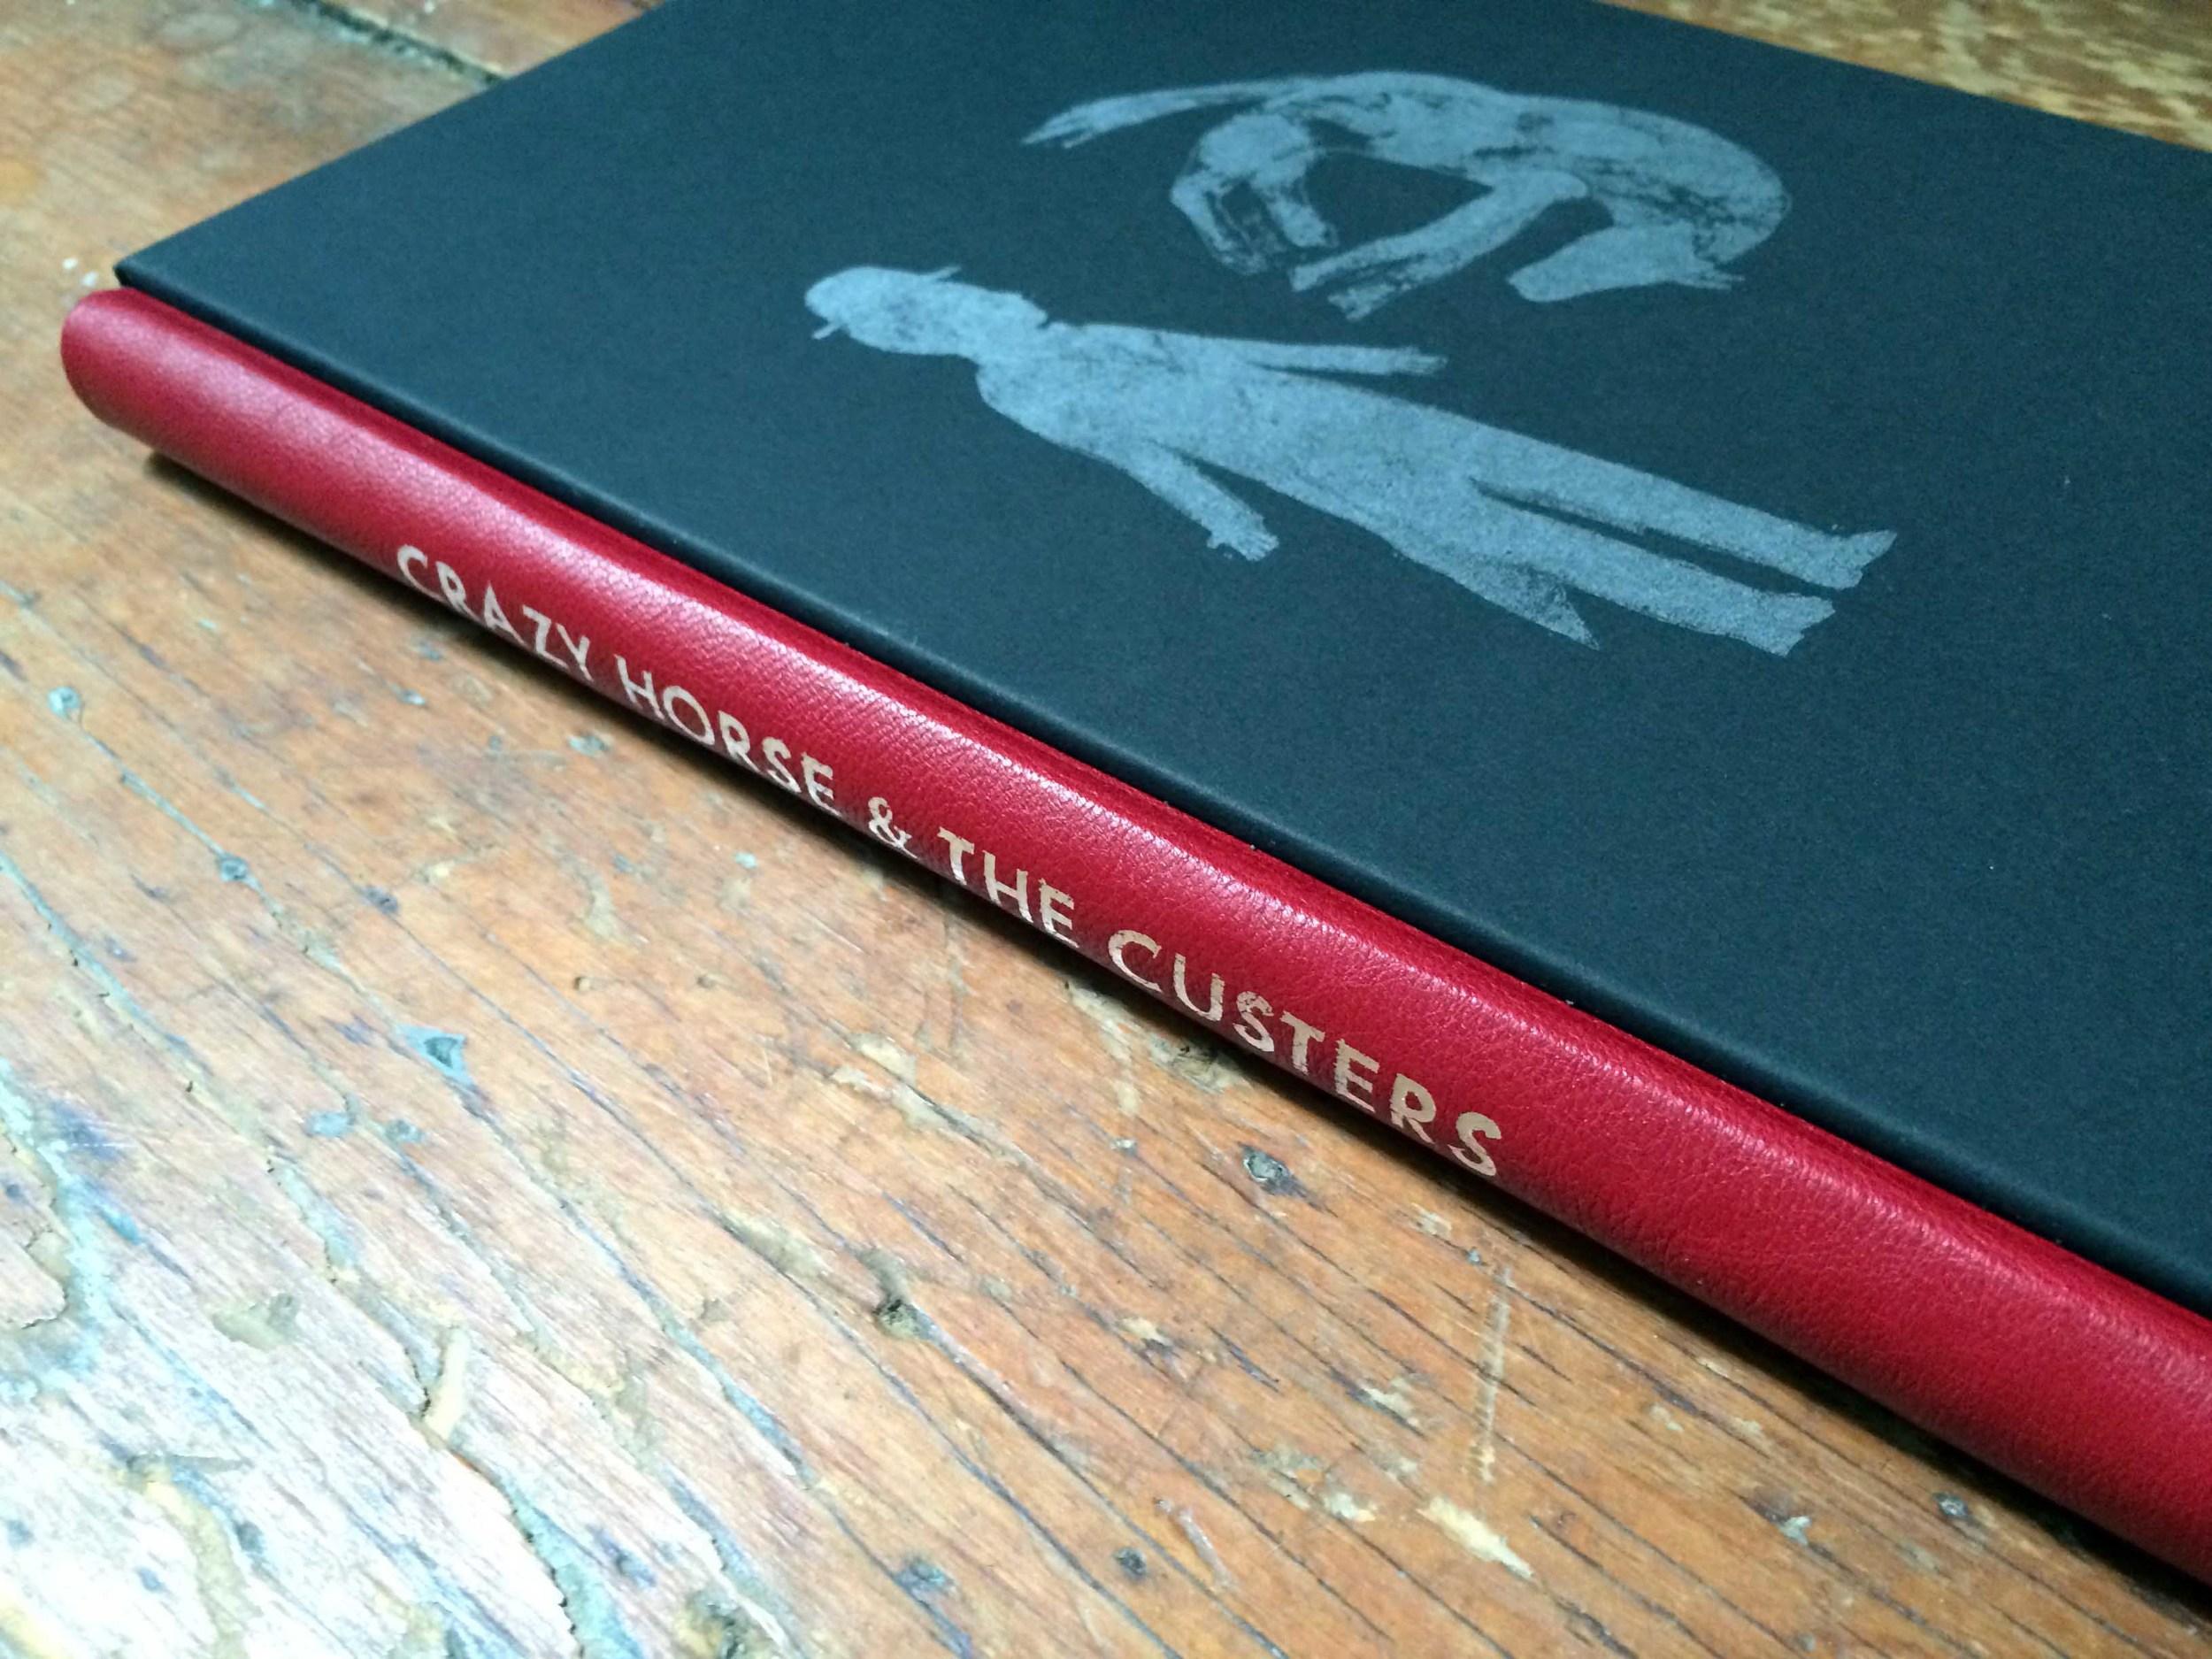 dski-Crazy-Horse-&-the-Custers-13.jpg